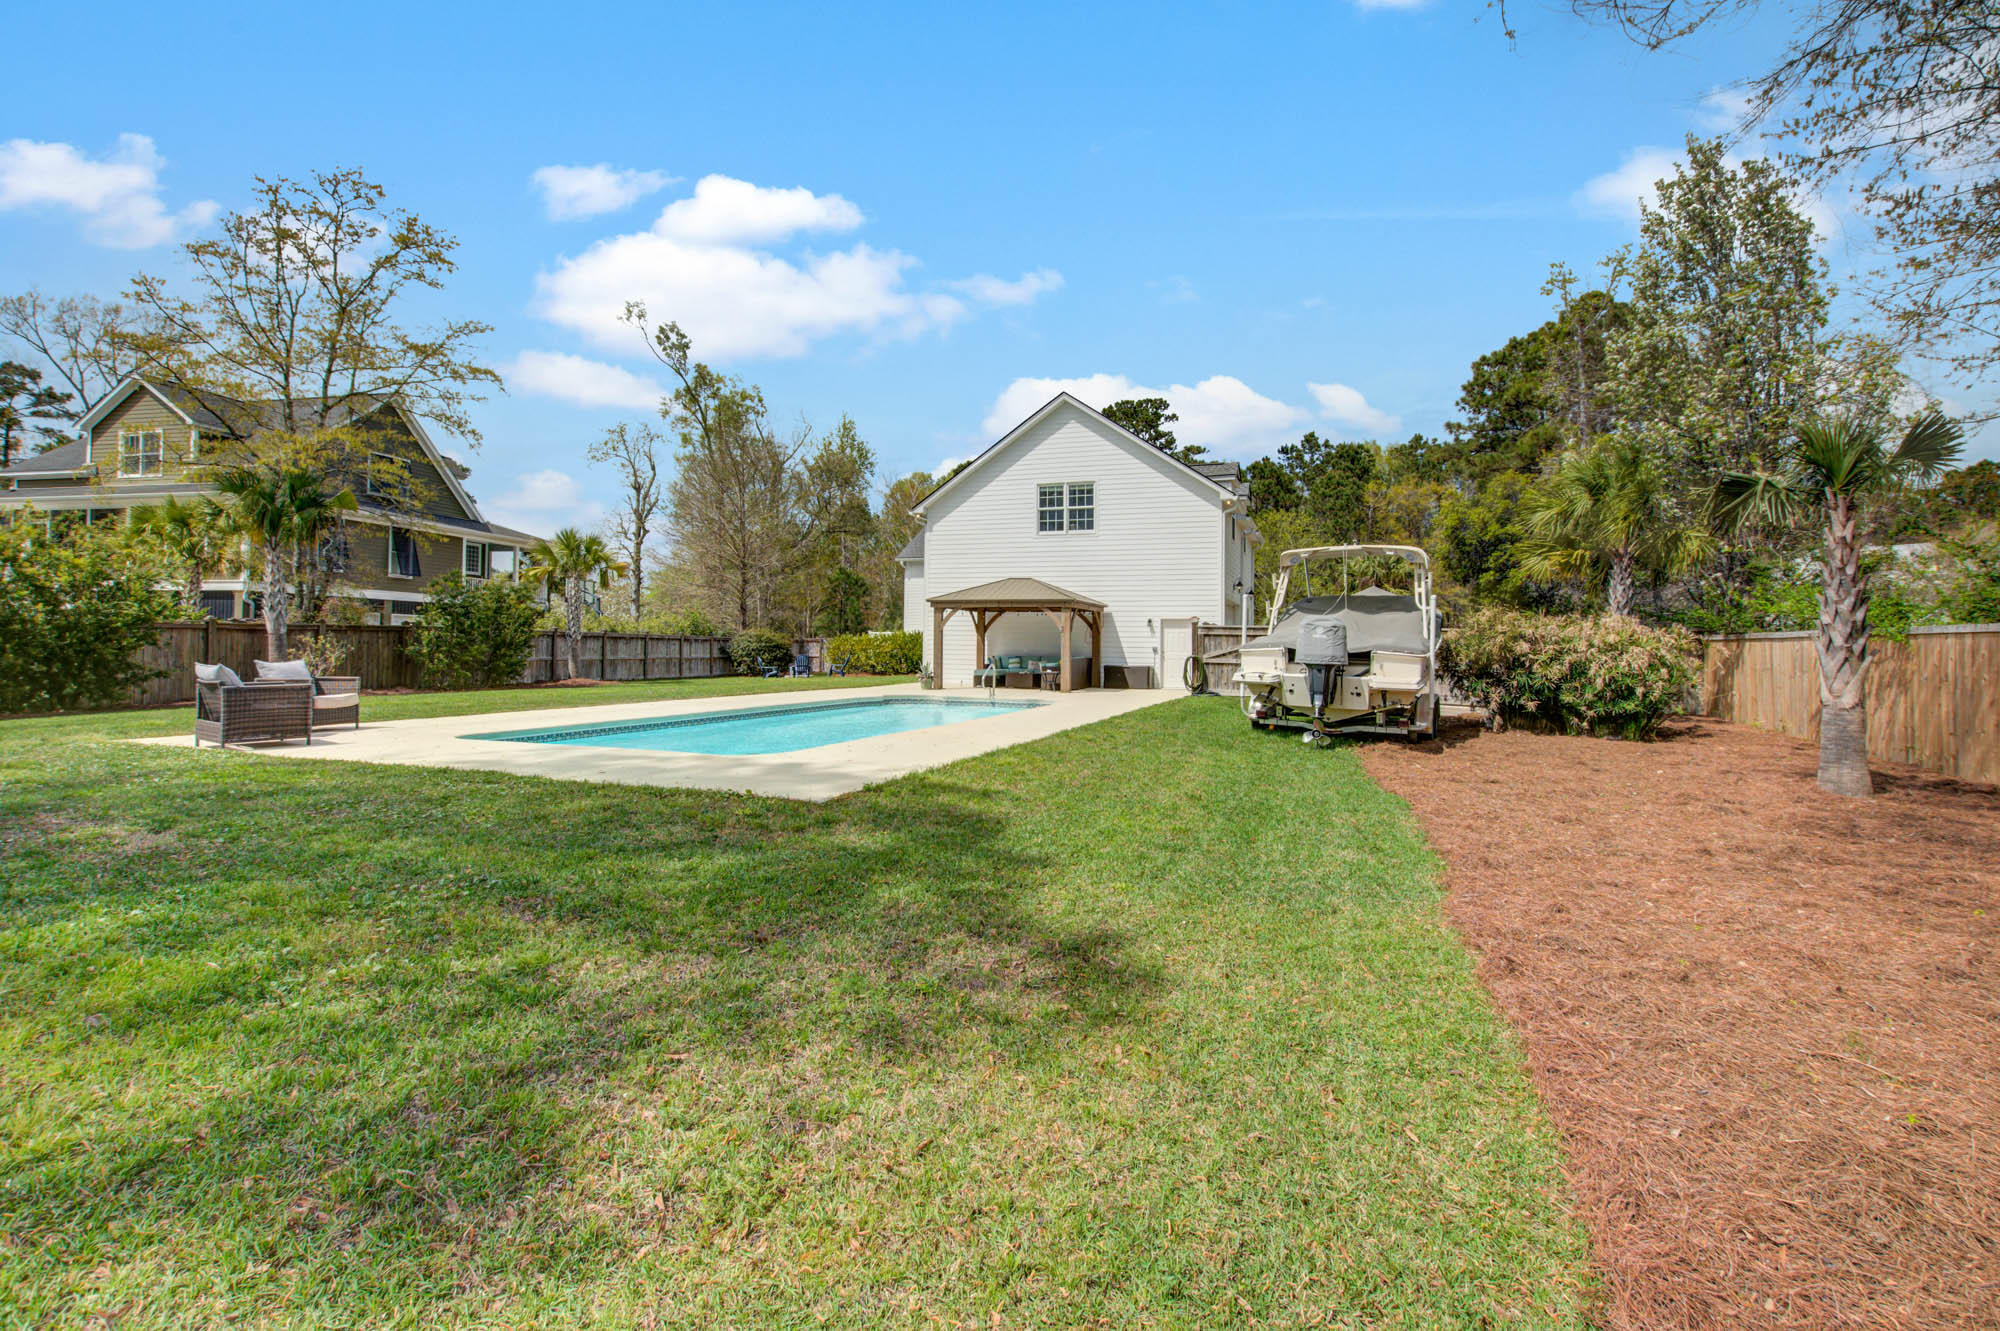 Darrell Creek Homes For Sale - 3783 Saint Ellens, Mount Pleasant, SC - 1